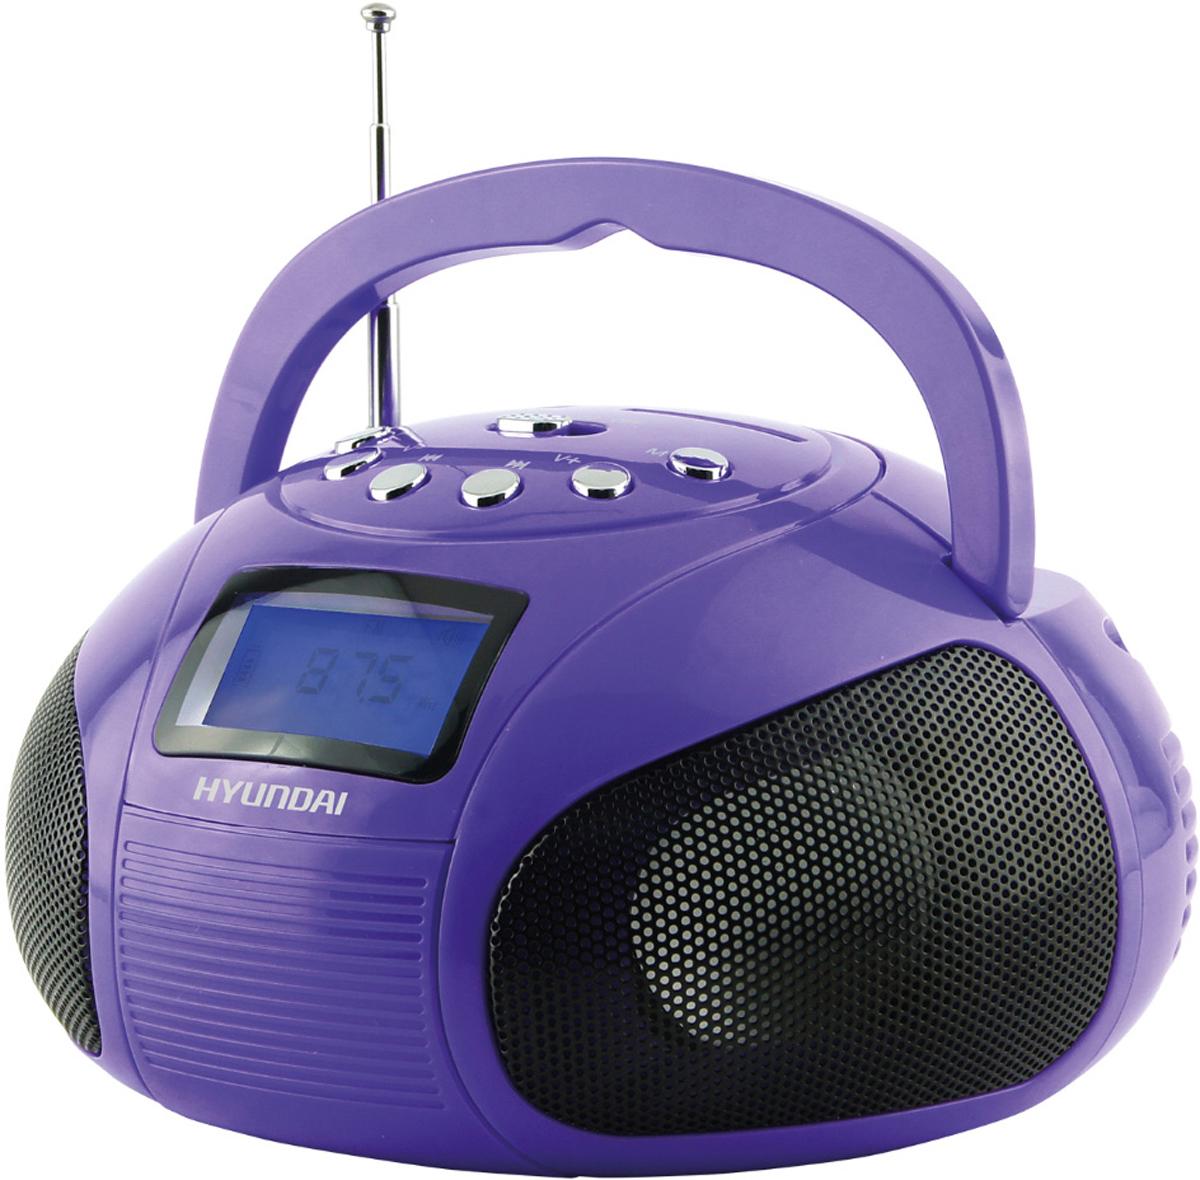 Hyundai H-PAS100, Violet магнитолаH-PAS100Аудиомагнитола Hyundai H-PAS100 фиолетовый 6Вт/MP3/FM(dig)/USB/SD